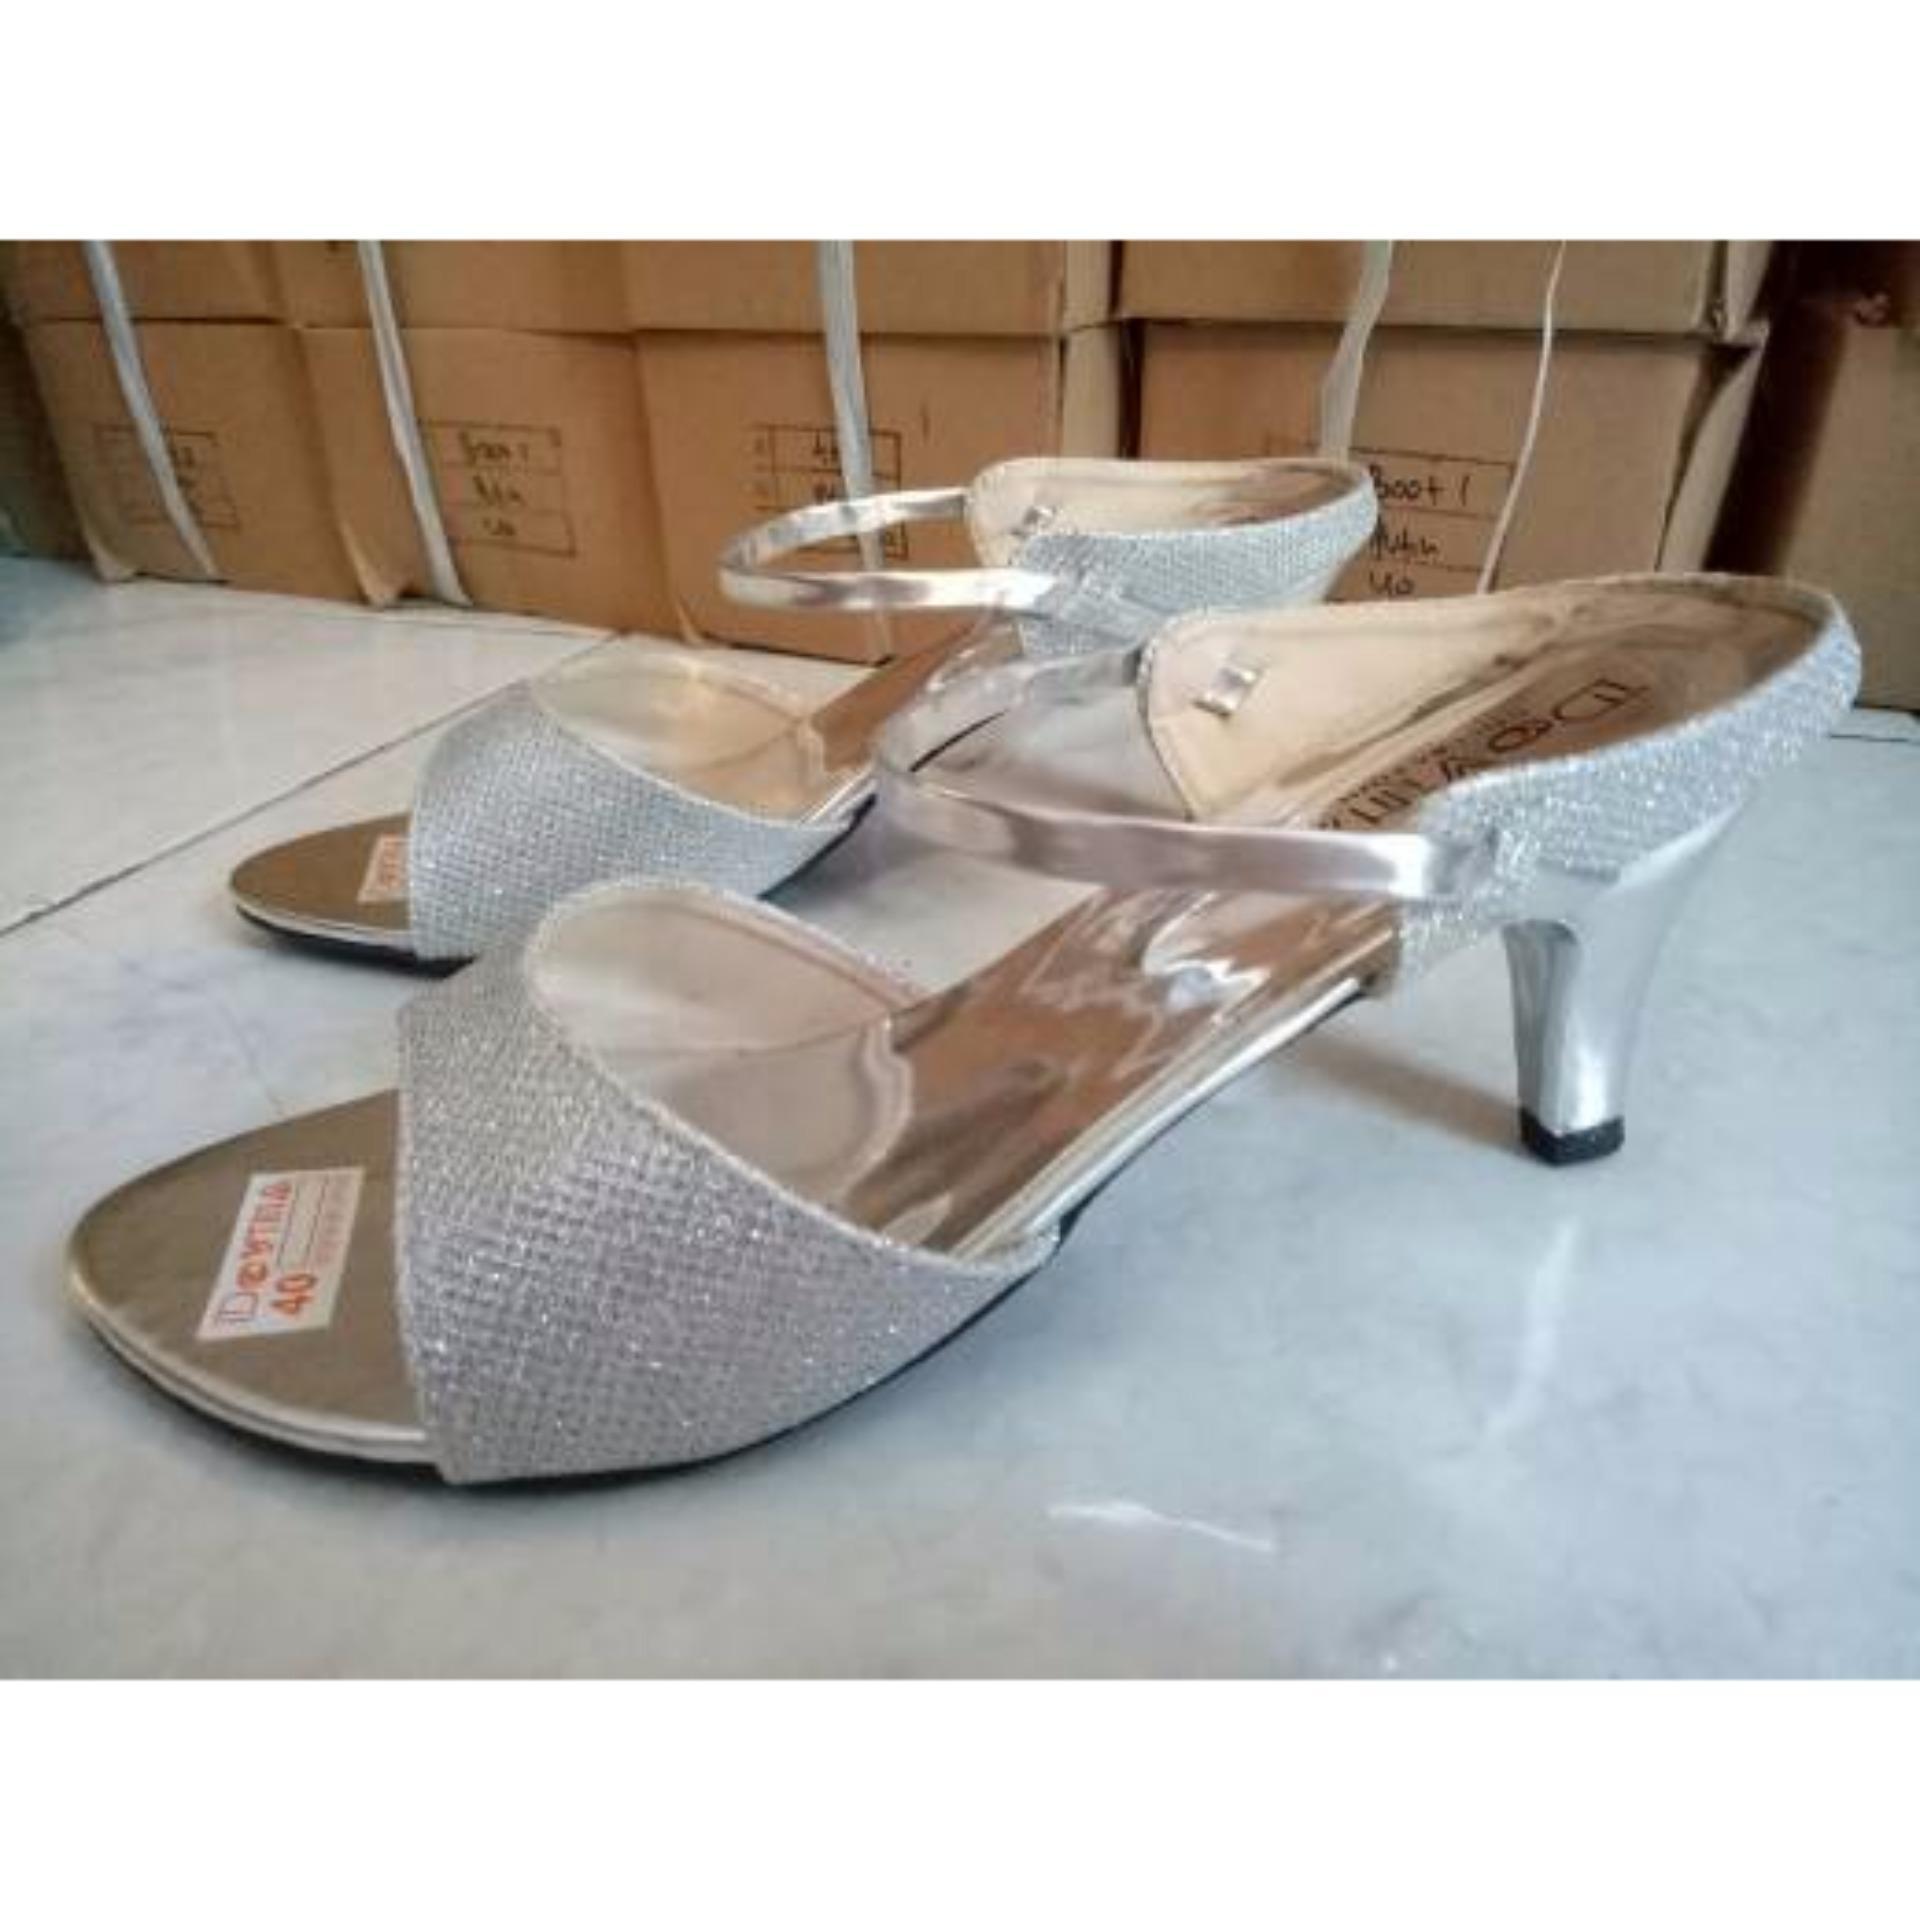 Sepatu Sandal High Heel Wanita Glitter Hak Lancip ...